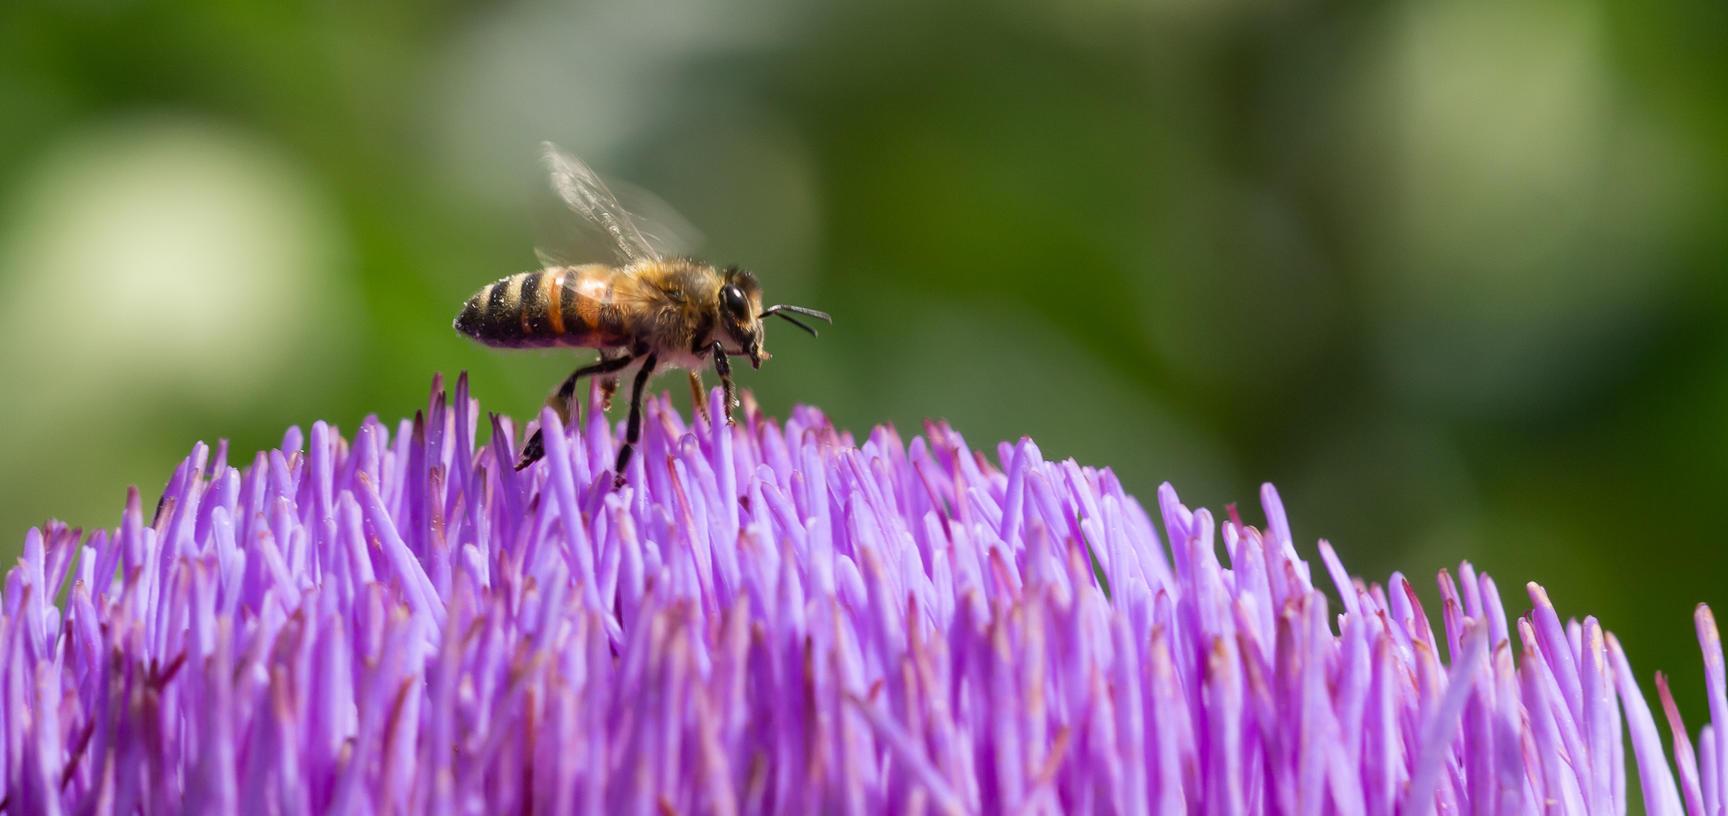 cynara cardunculus  globe artichoke  oxford botanic garden  bee  lower garden  plants that changed the world